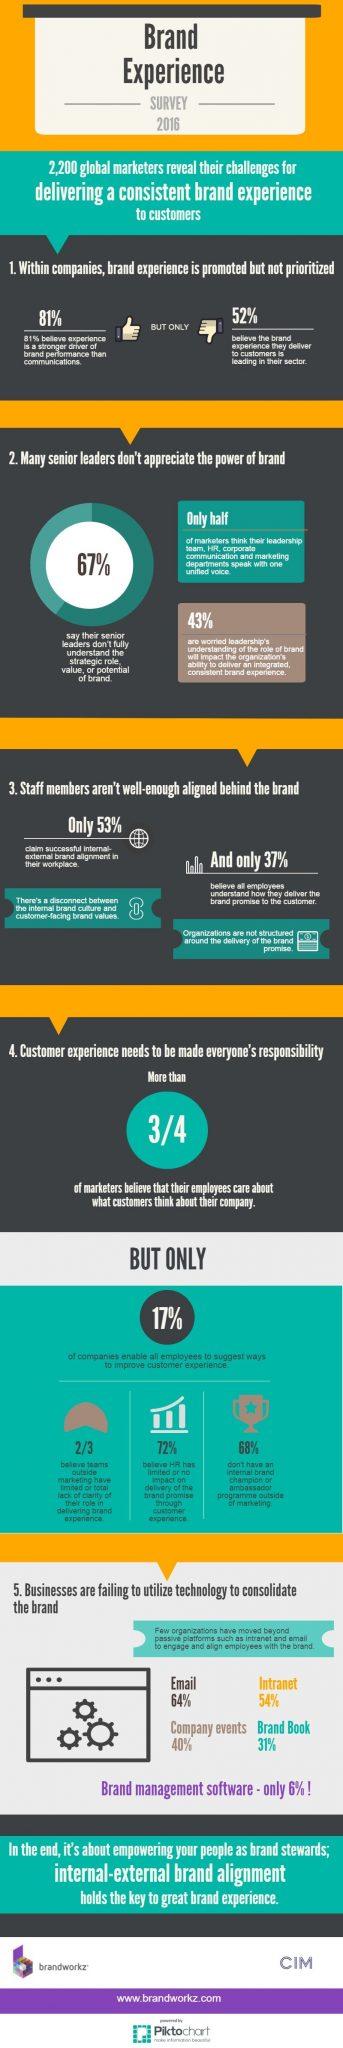 CIM Brand Experience Infographic